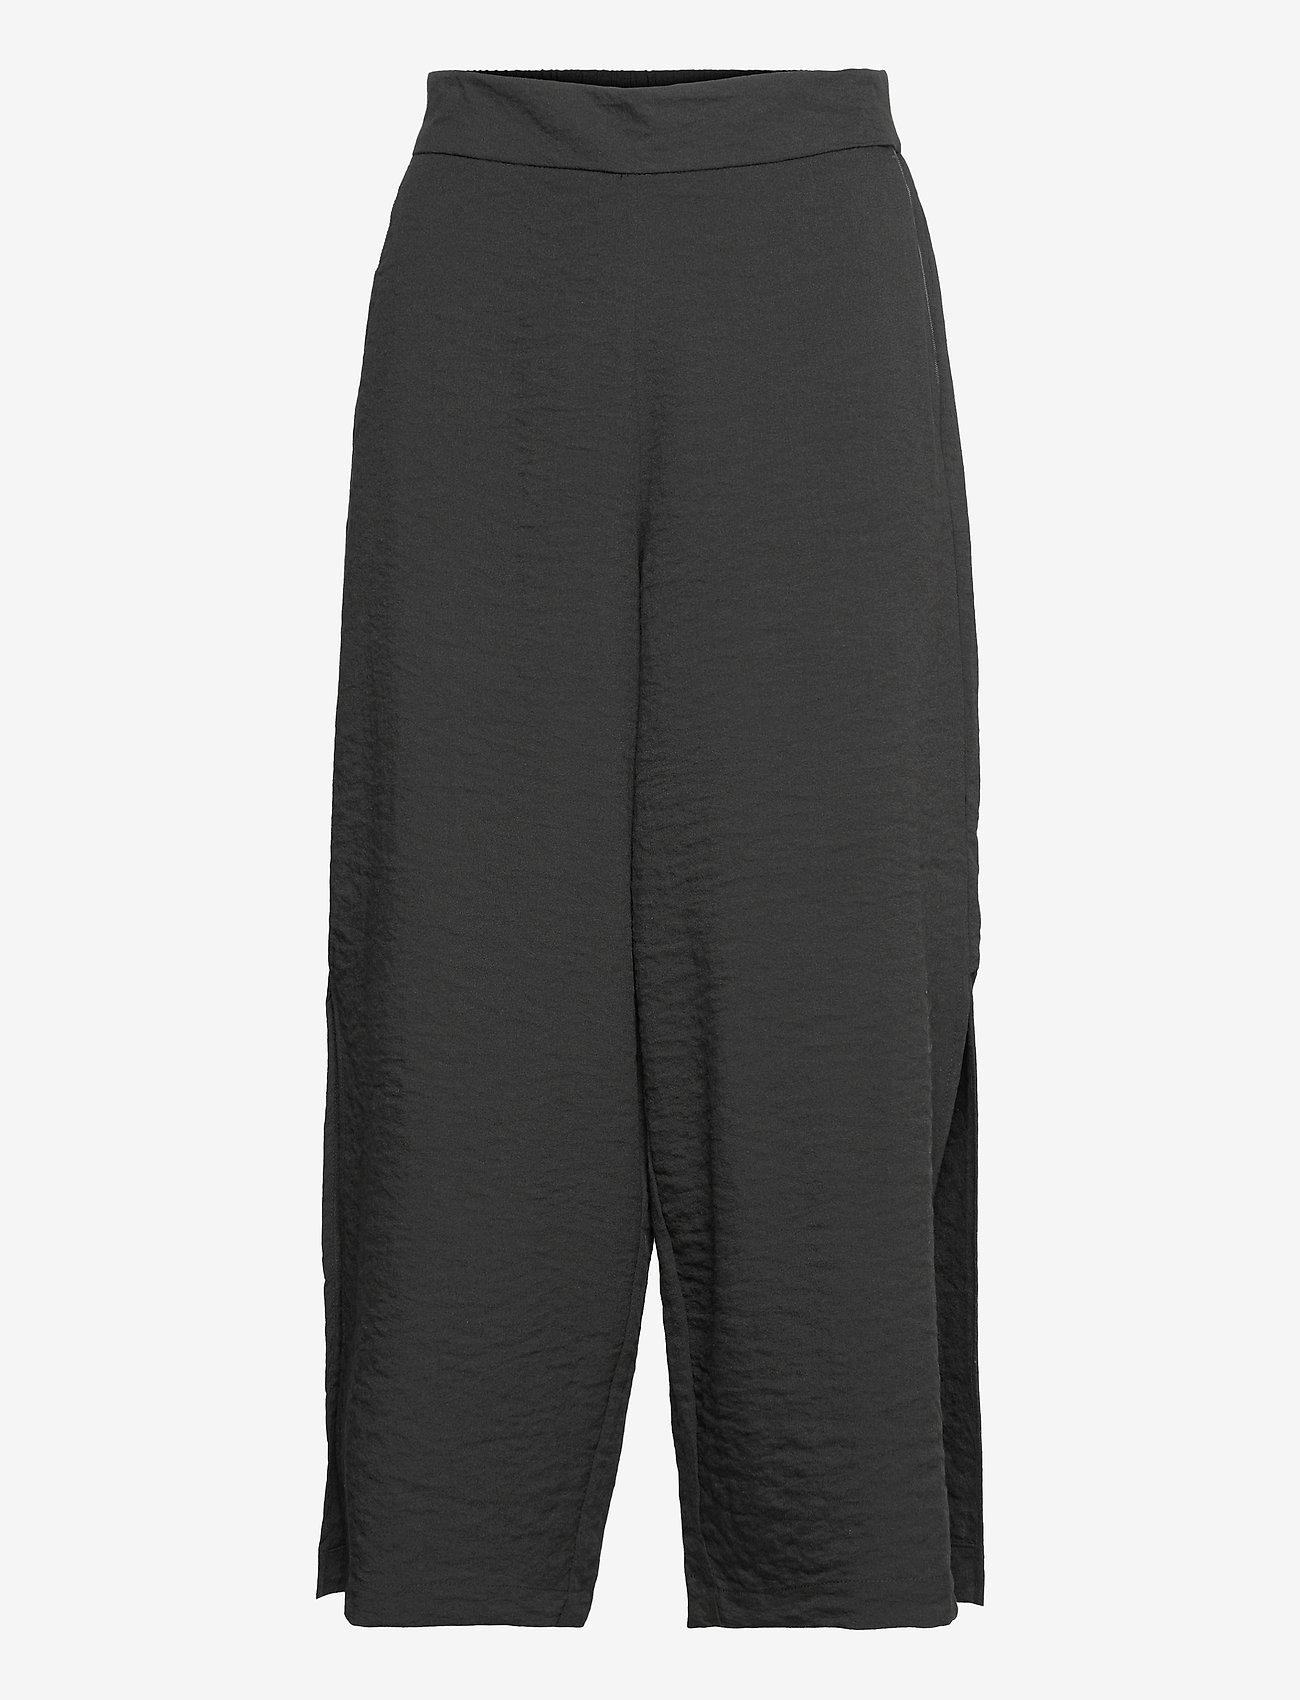 Vila - VILINEA RW 7/8 PANTS/2 - bukser med brede ben - black - 0